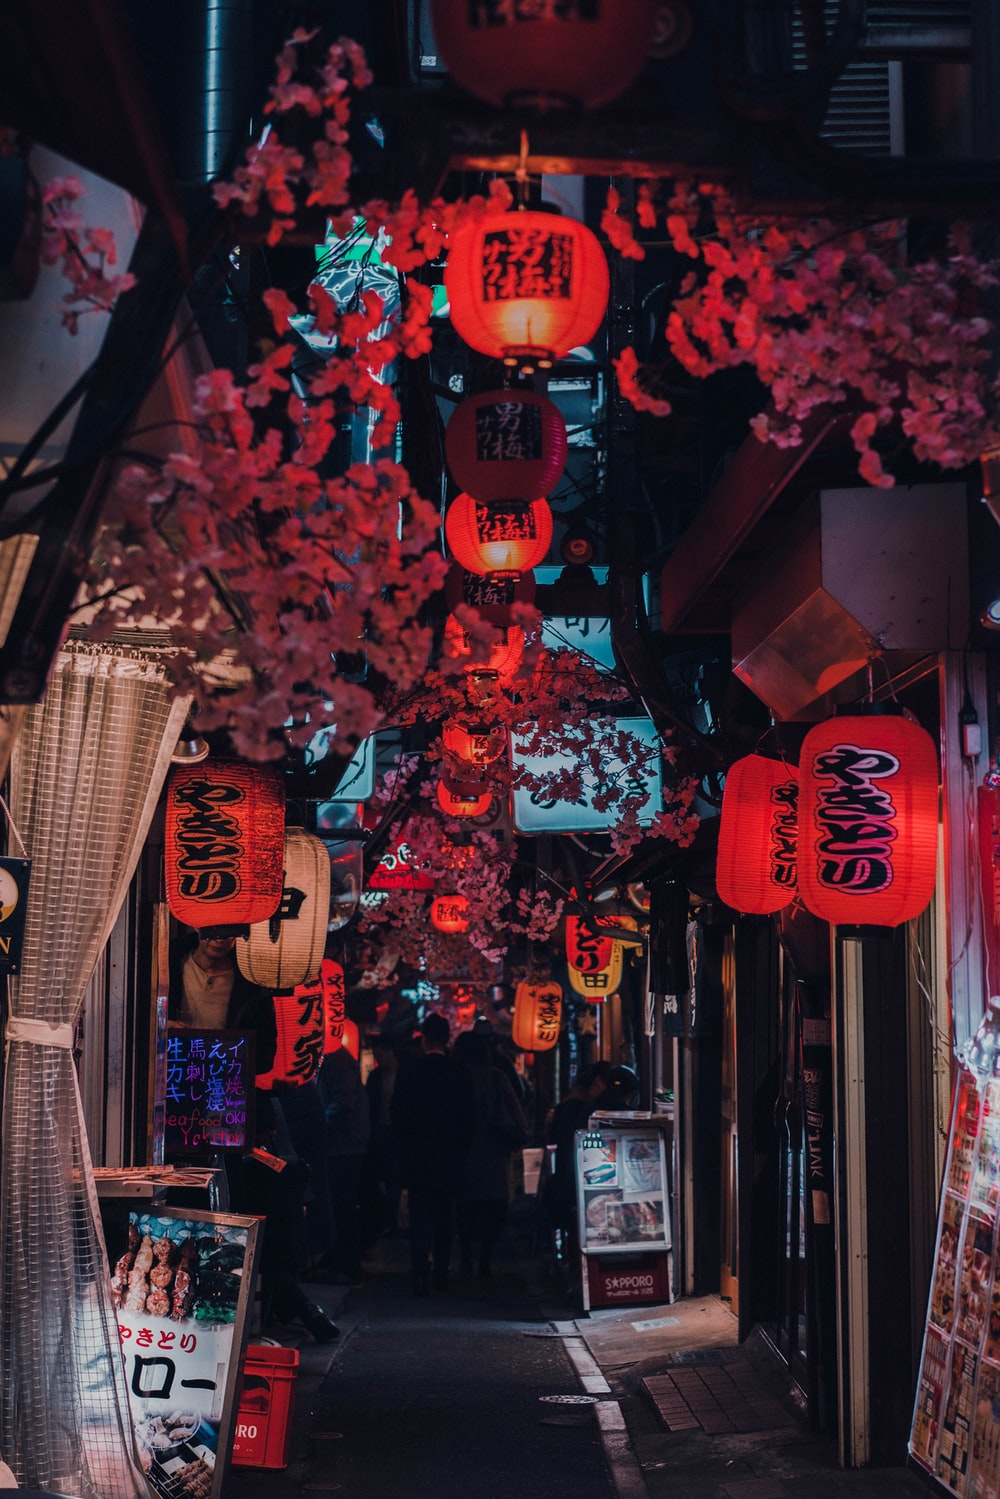 people walking on street with red lanterns